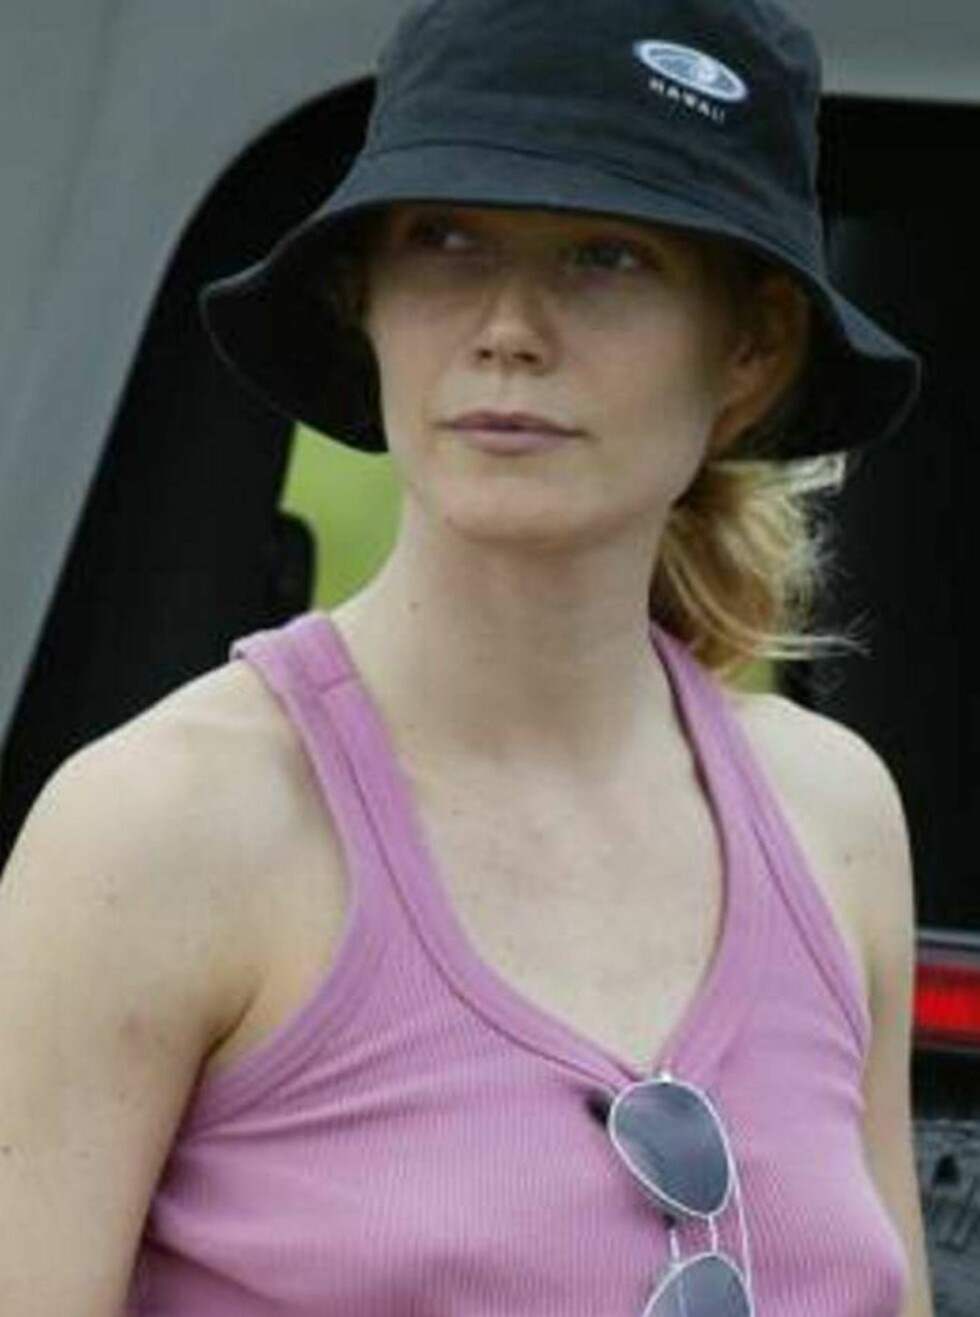 BURDE HATT BH: Gwyneth husket hatt, men glemte BH... Foto: All Over Press